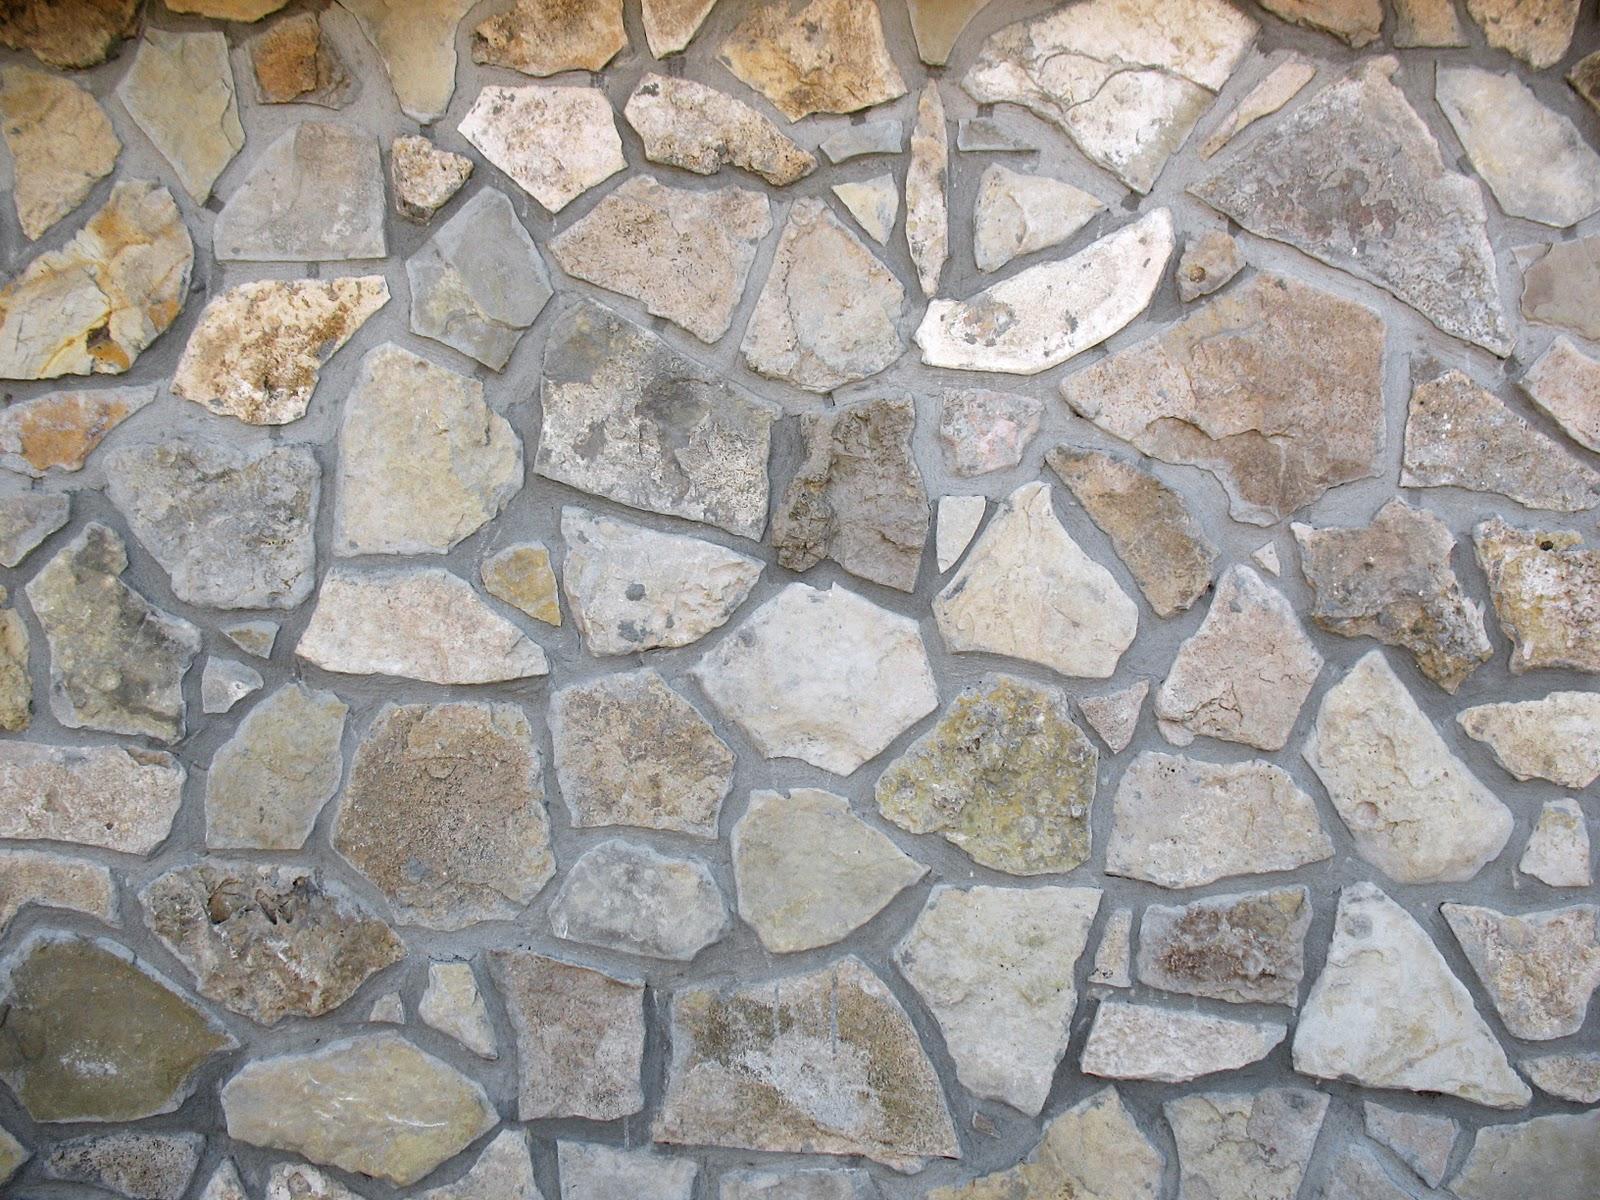 Wallpaper A Bumpy Wall   wallpaper toplist 1600x1200